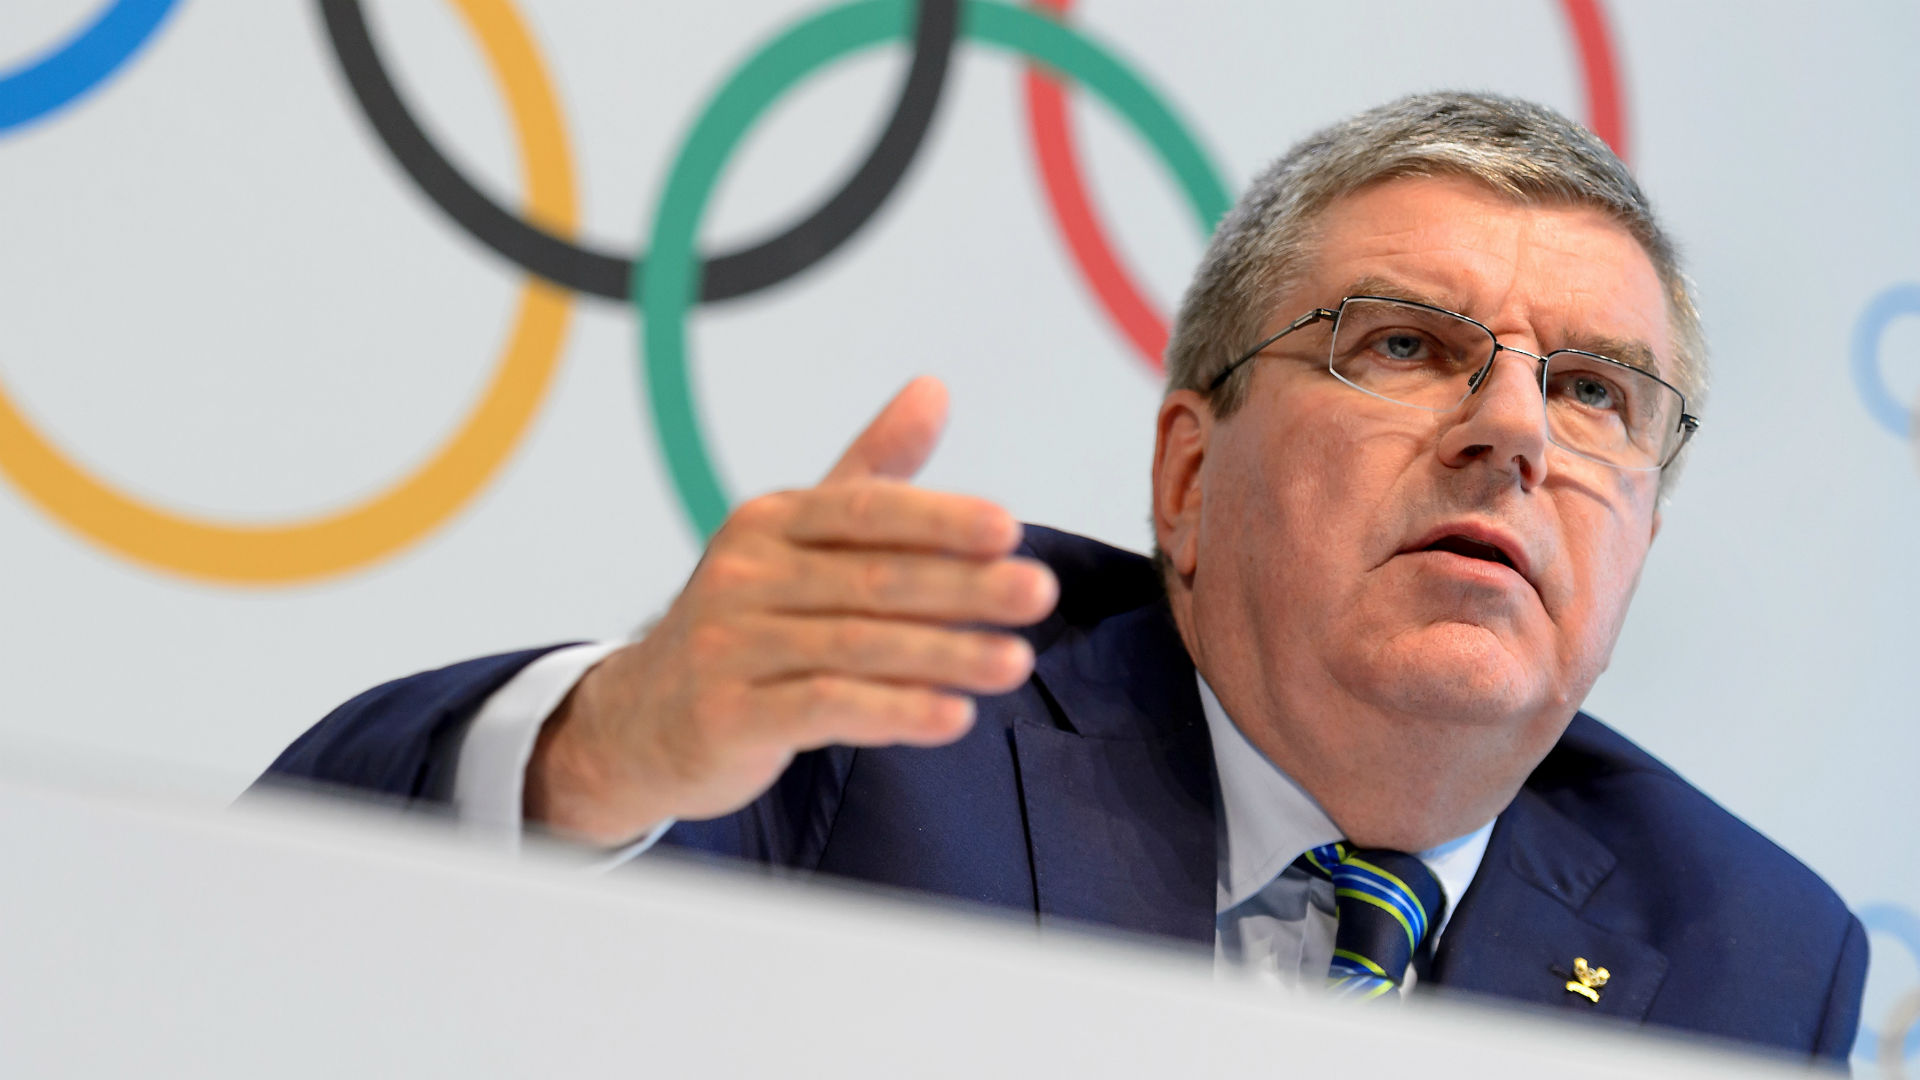 Киберспорт в числе кандидатов на включение в программу Олимпийских игр